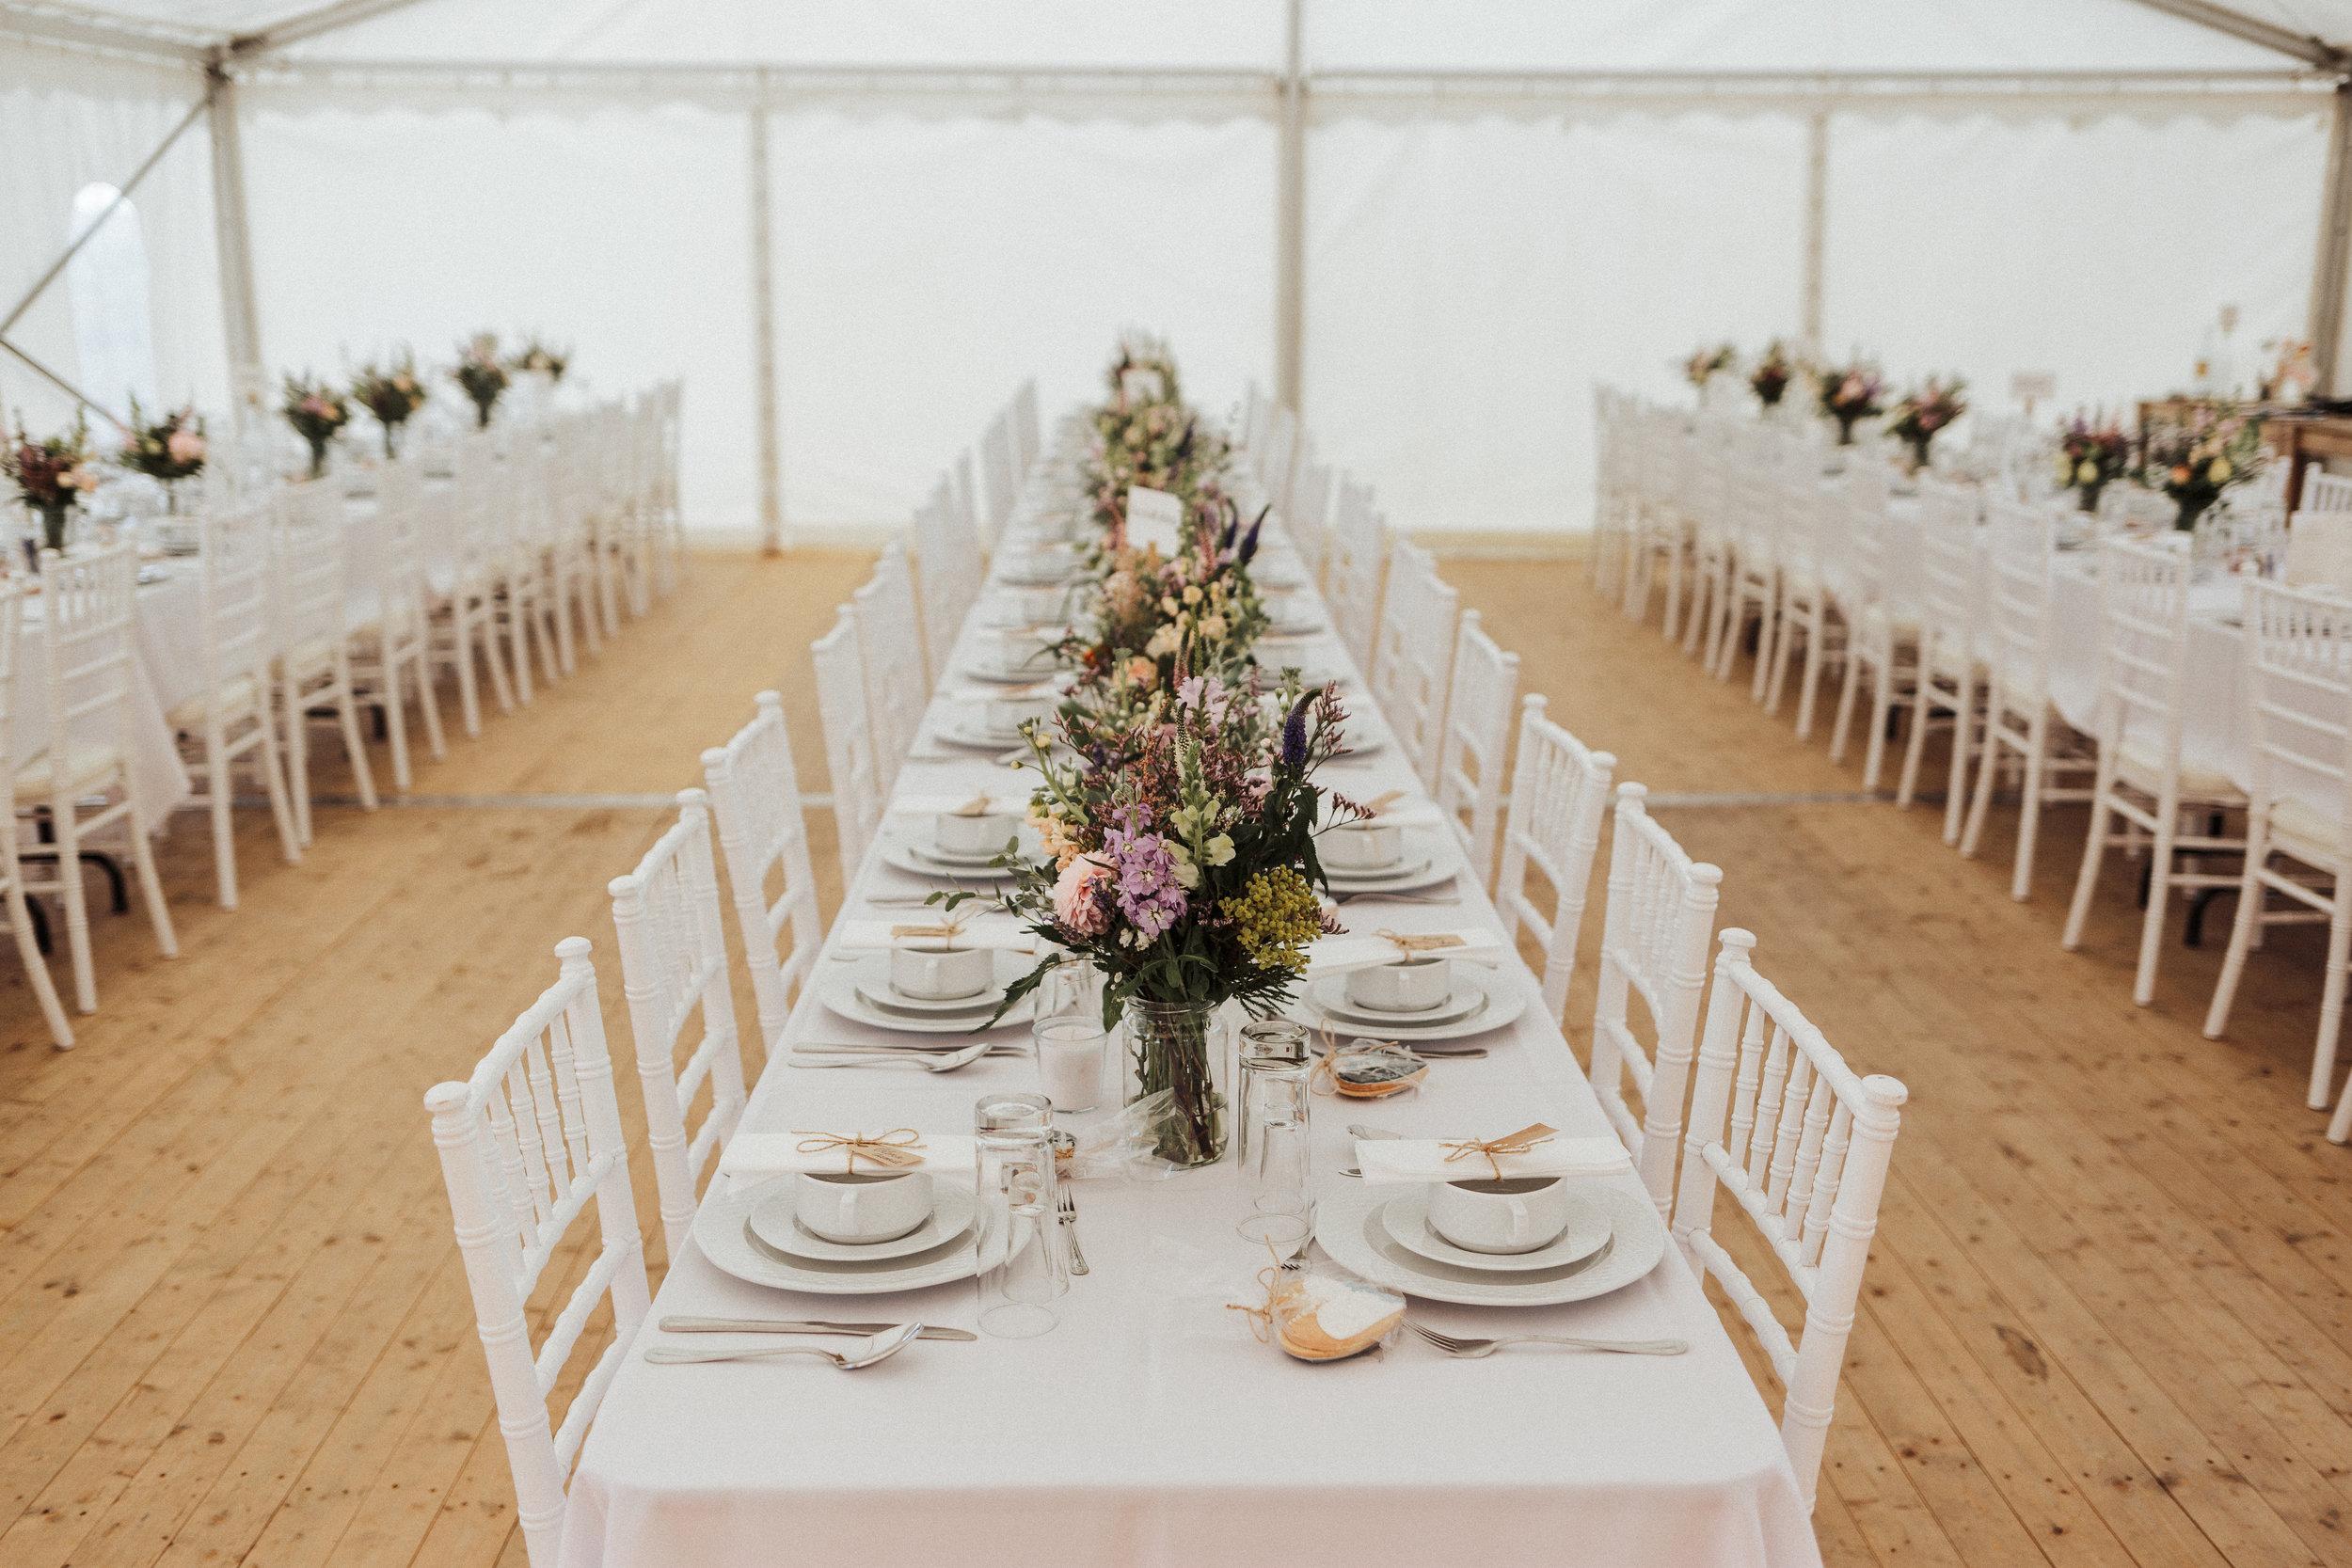 20170902_Monika+Marci_wedding_f_603__MG_4667_1.jpg